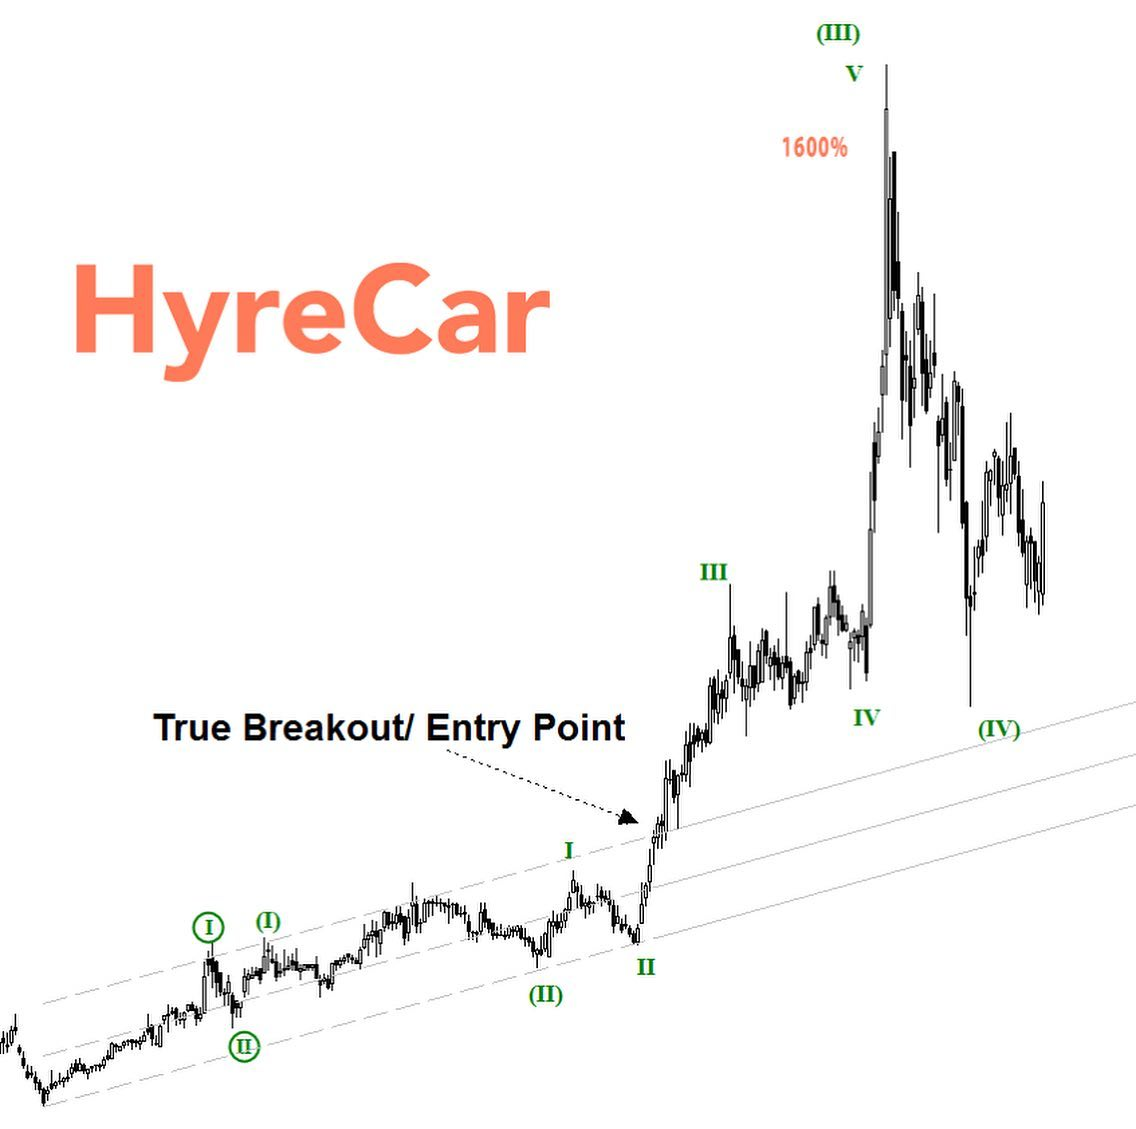 Hyre Car